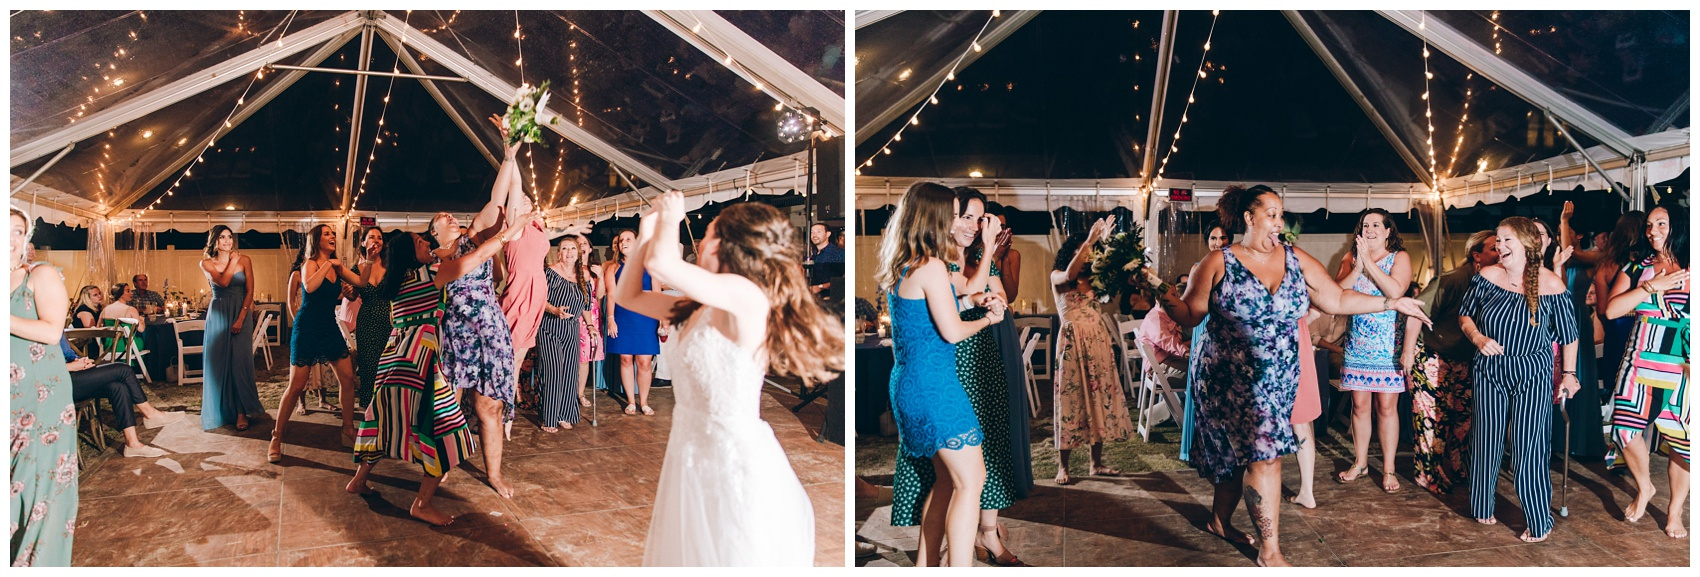 Outer-Banks-Corolla-Wedding_0124.jpg